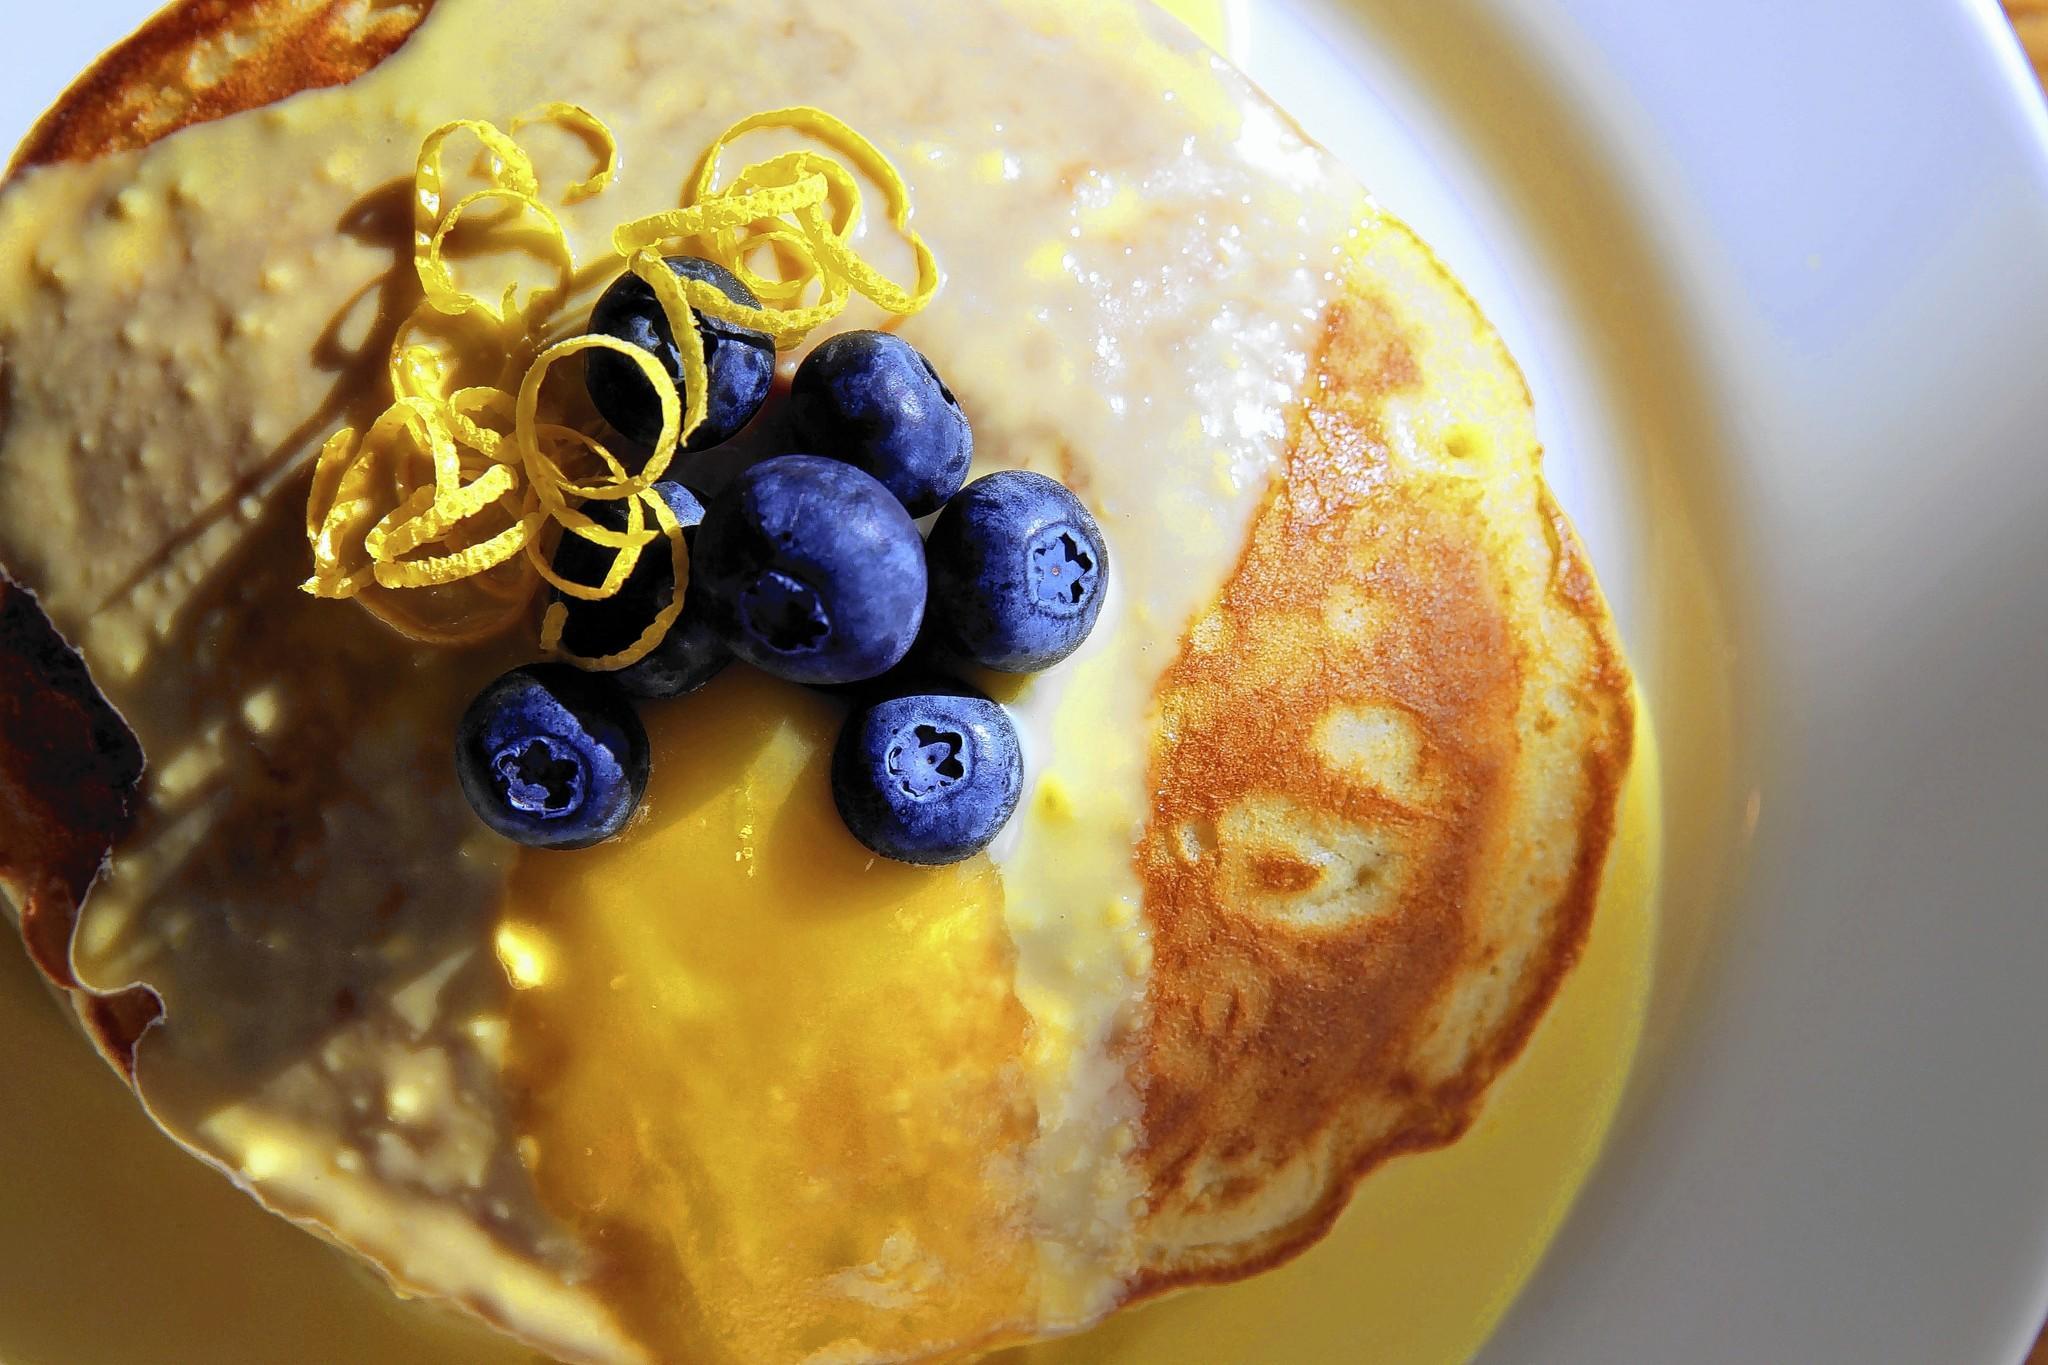 The lemon pancakes served at Kingsbury St. Cafe.